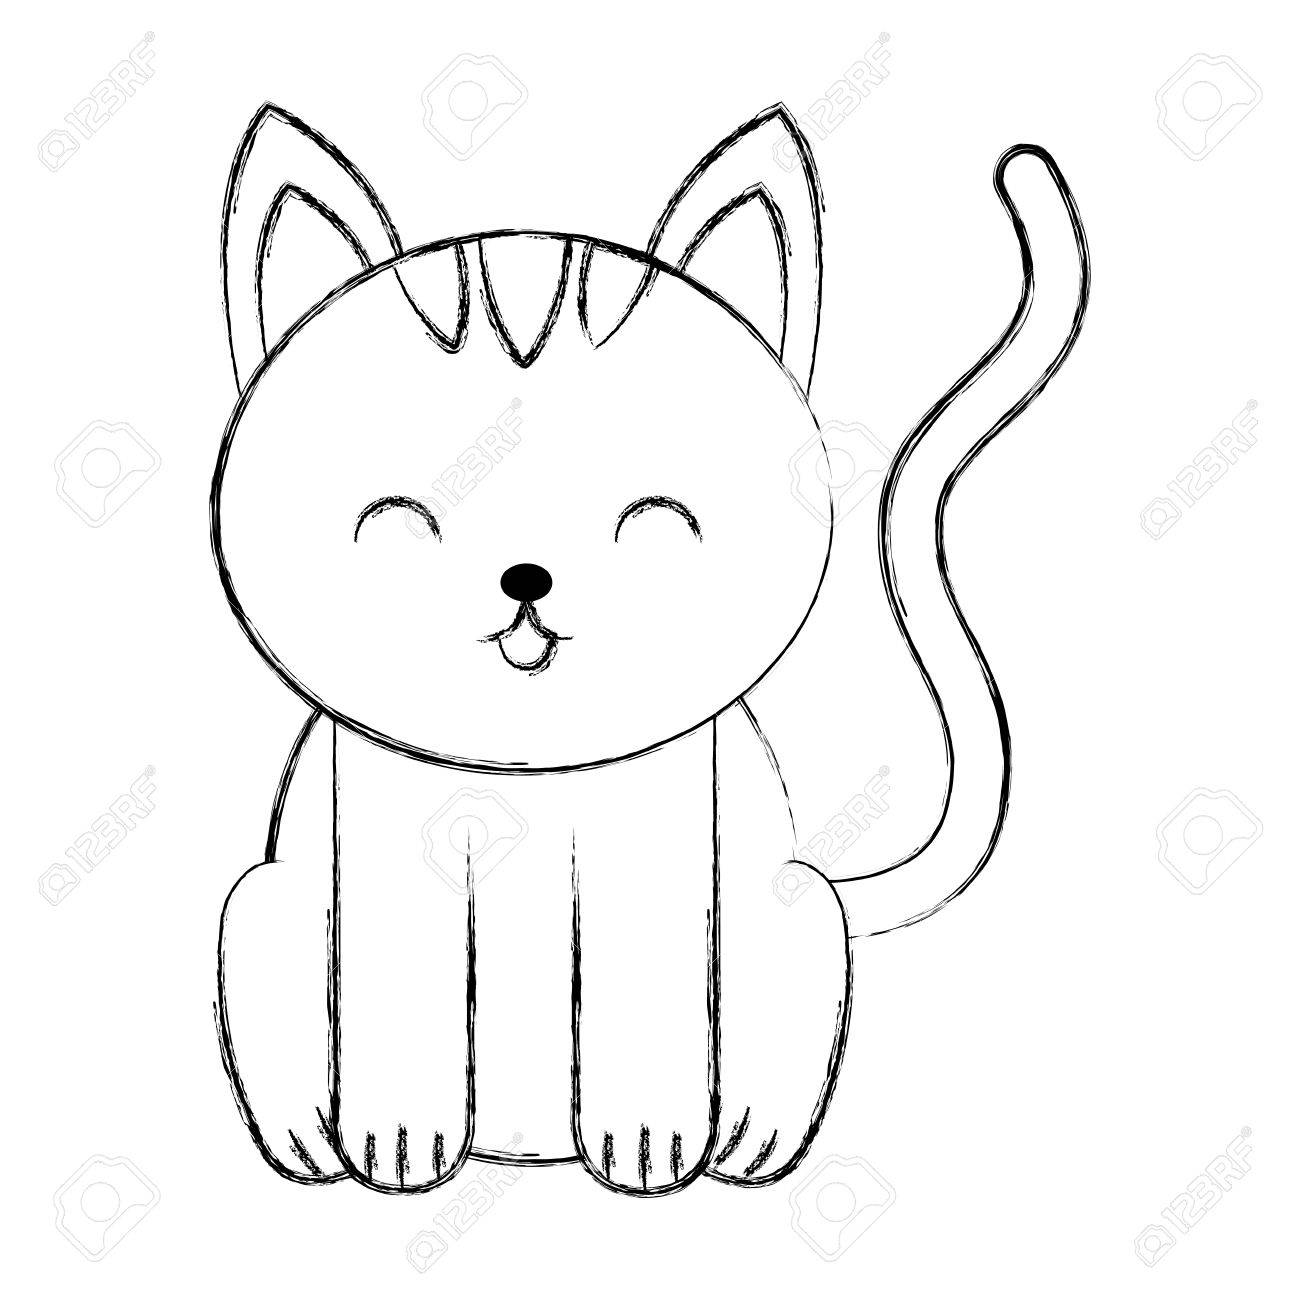 Cat Cartoon Black And White